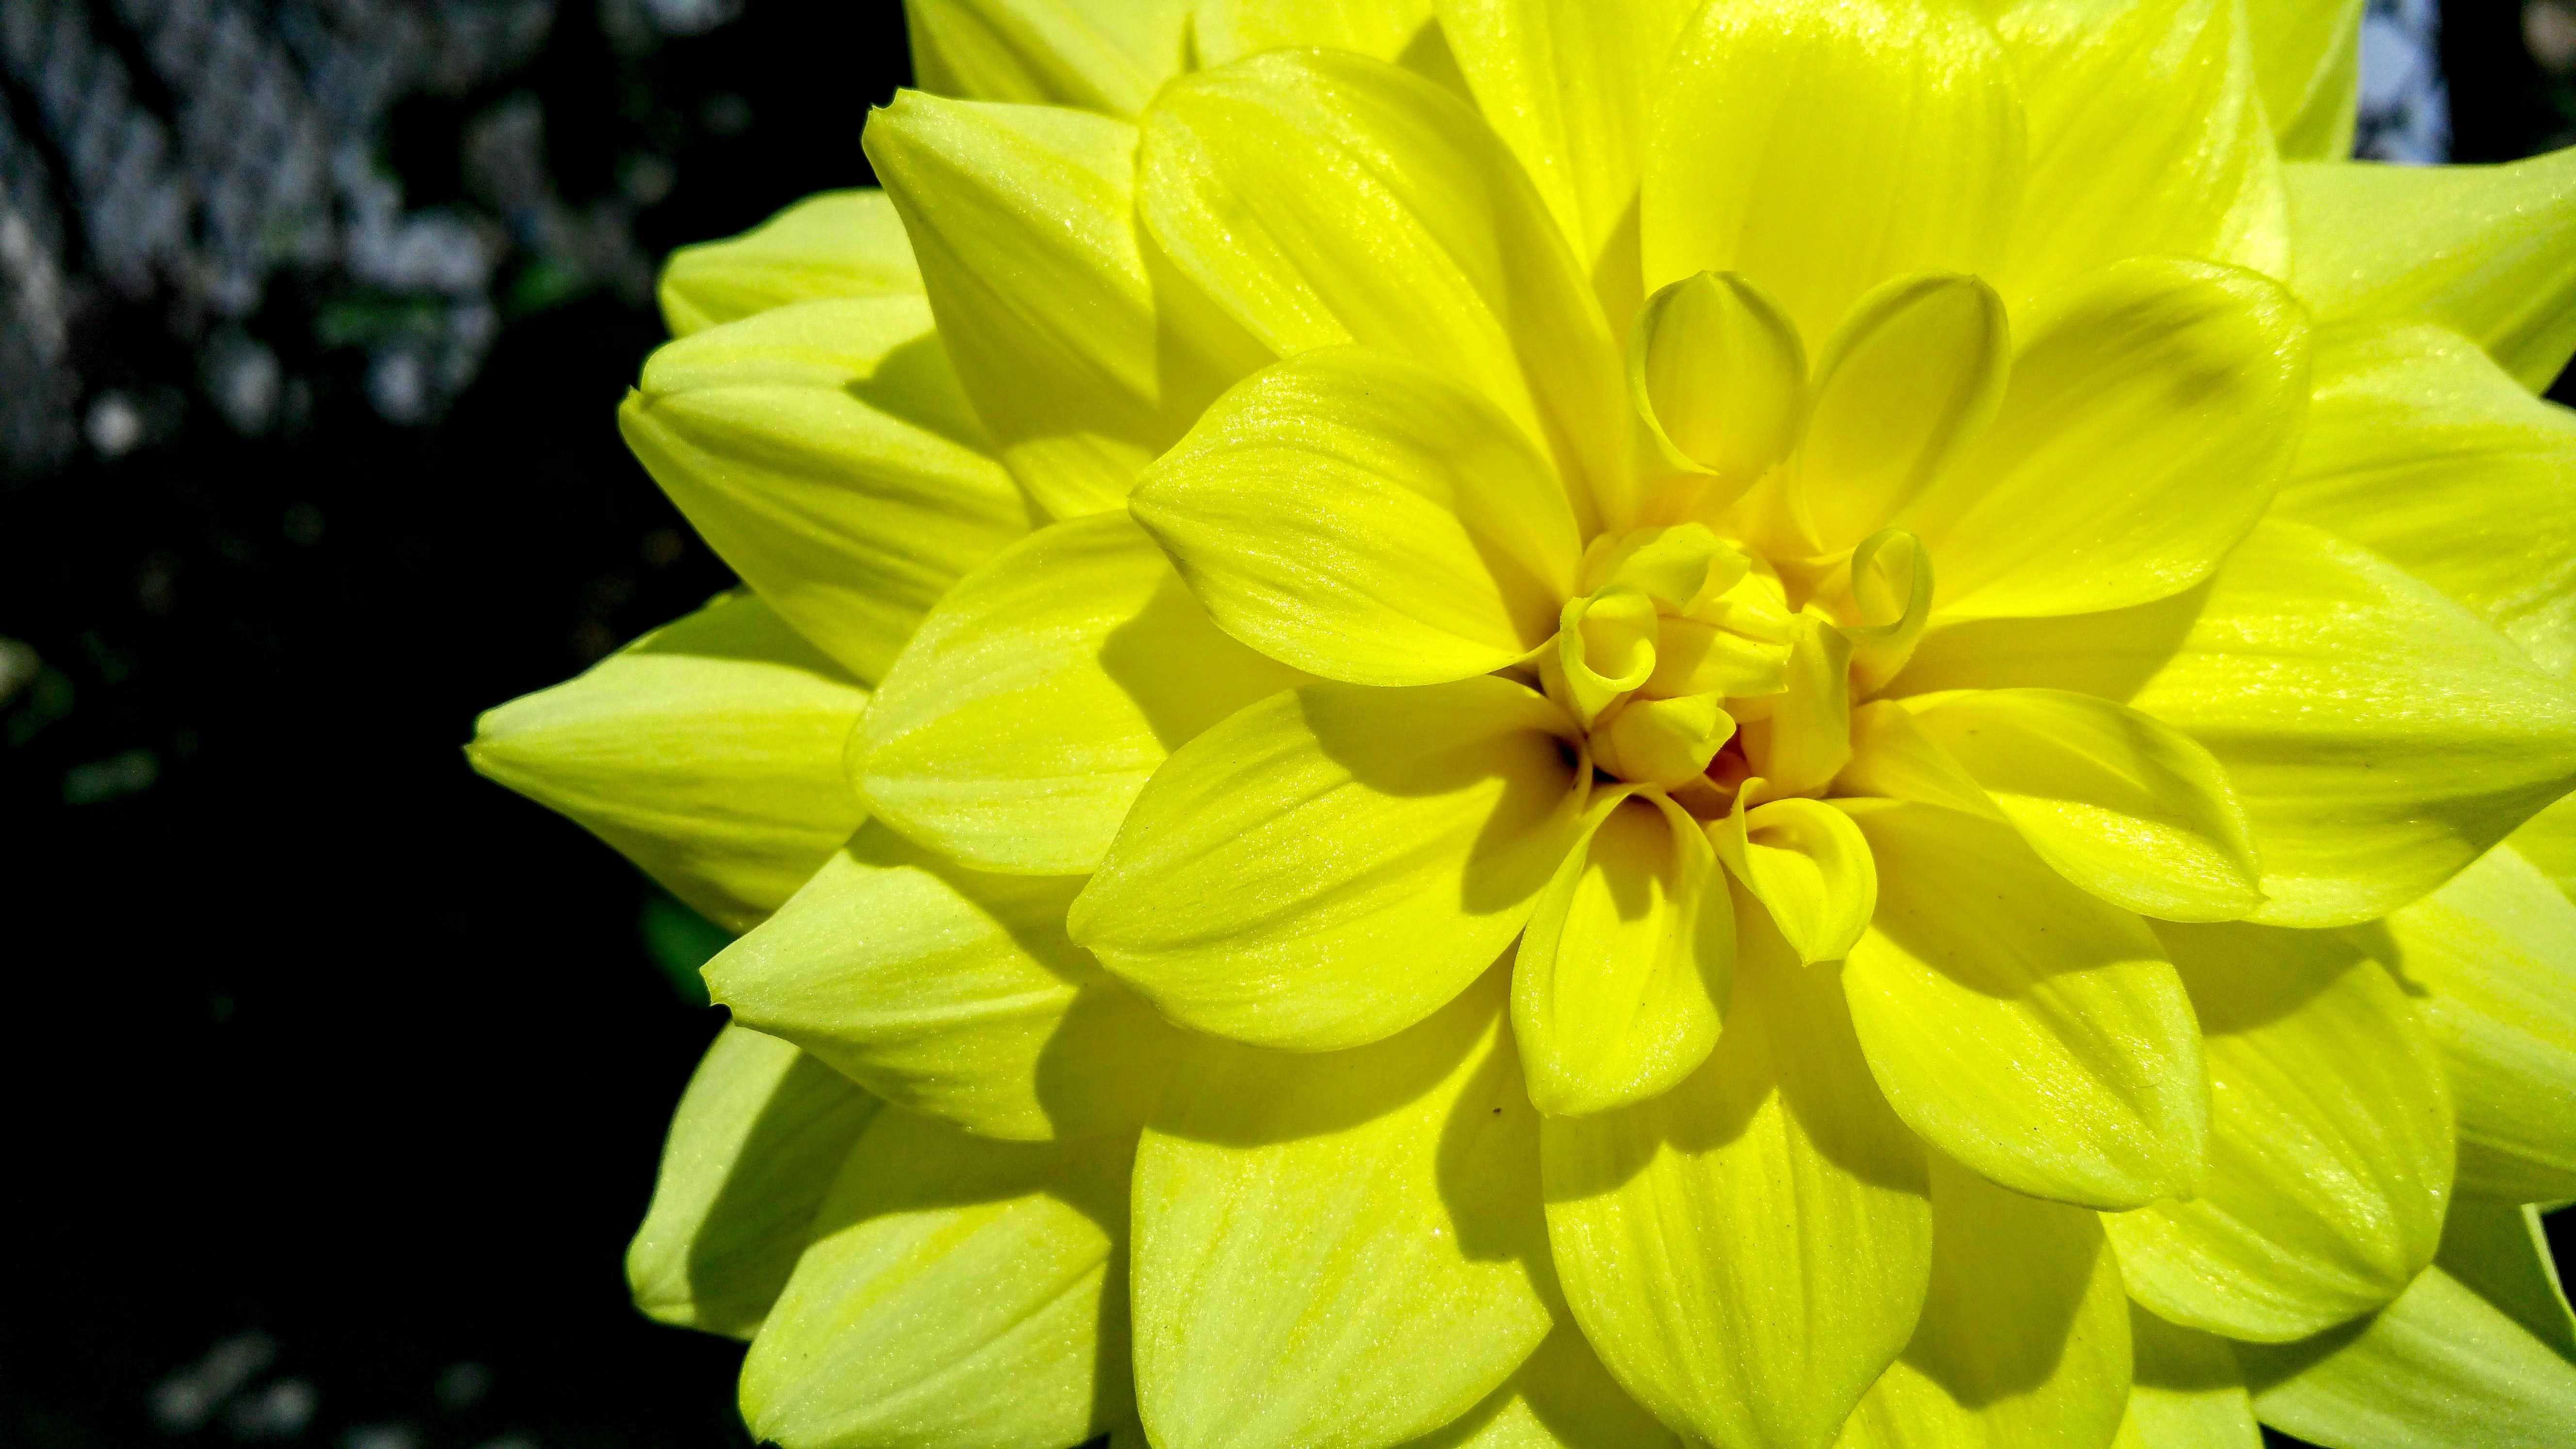 1000 Beautiful Single Flower Photos Pexels Free Stock: 1000+ Beautiful Yellow Flower Photos · Pexels · Free Stock